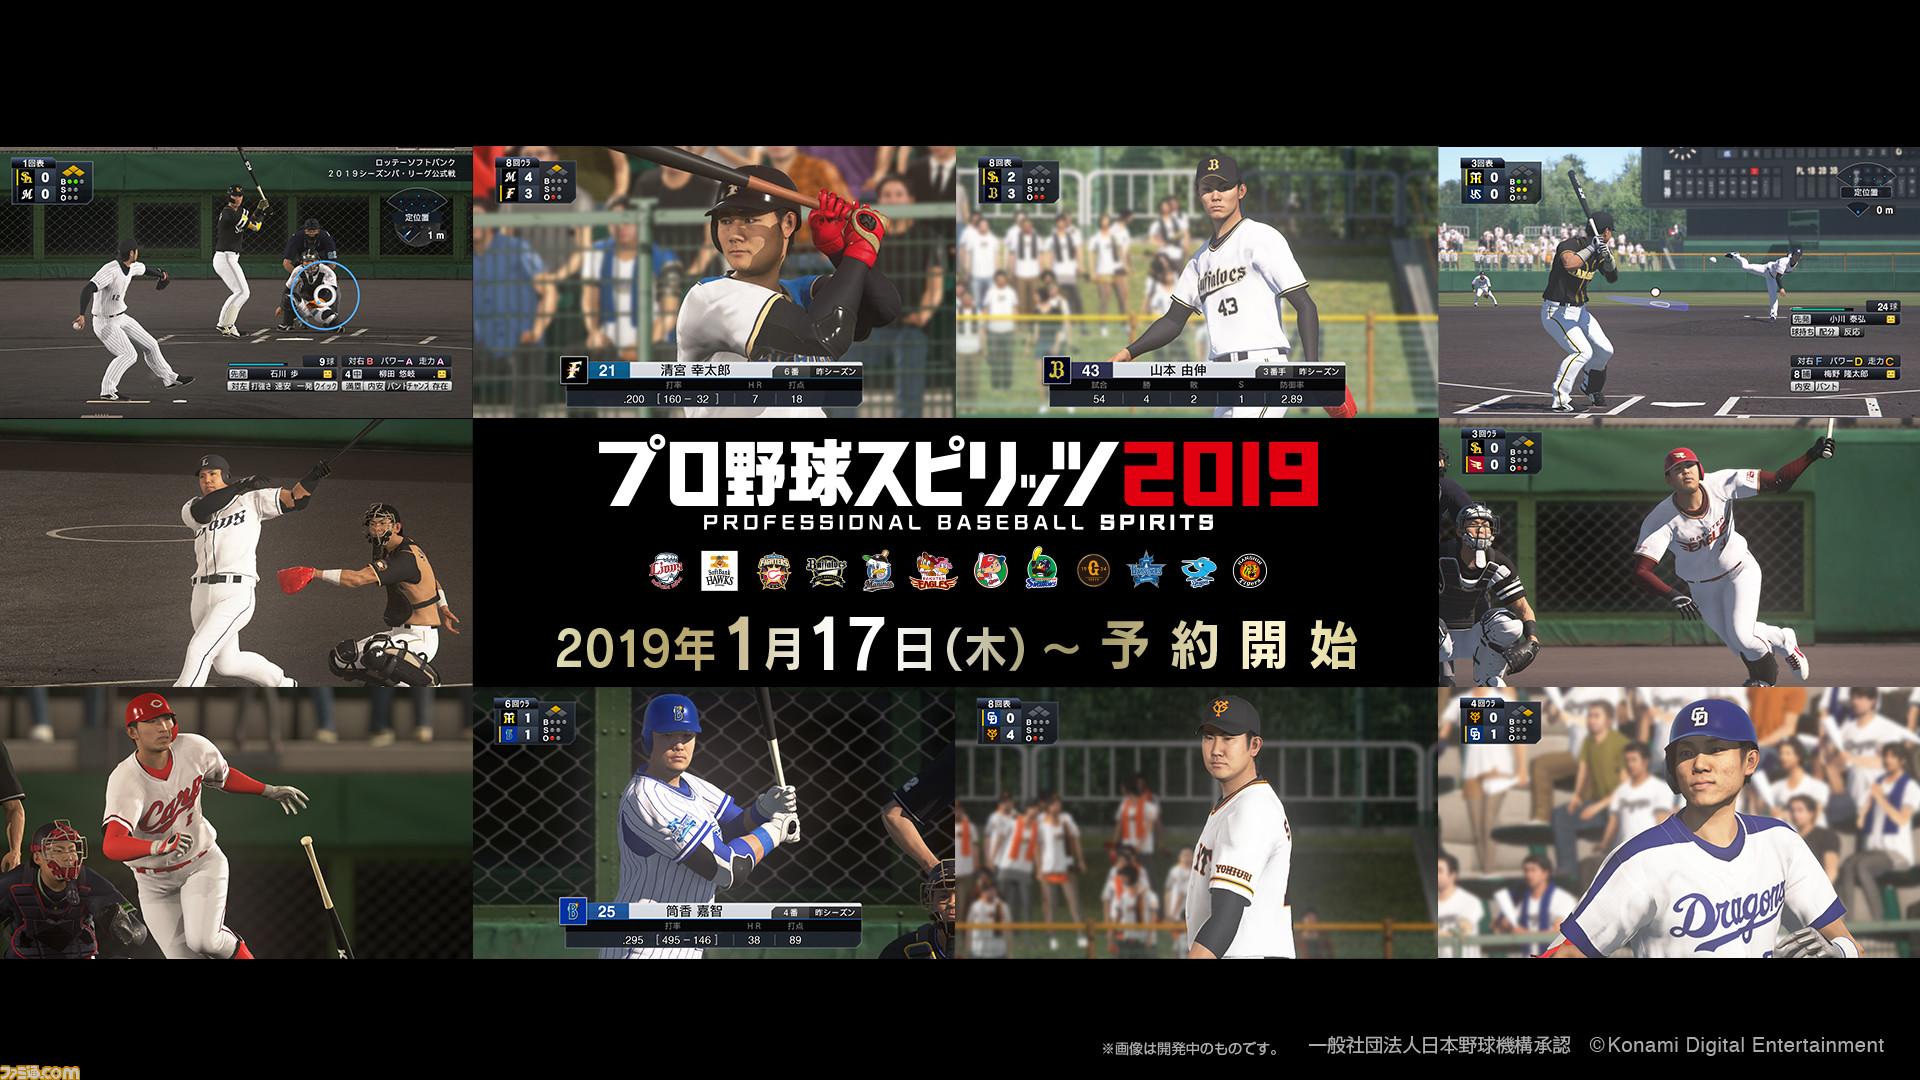 Ps4 Ps Vita プロ野球スピリッツ 2019 発売日が2019年4月25日に